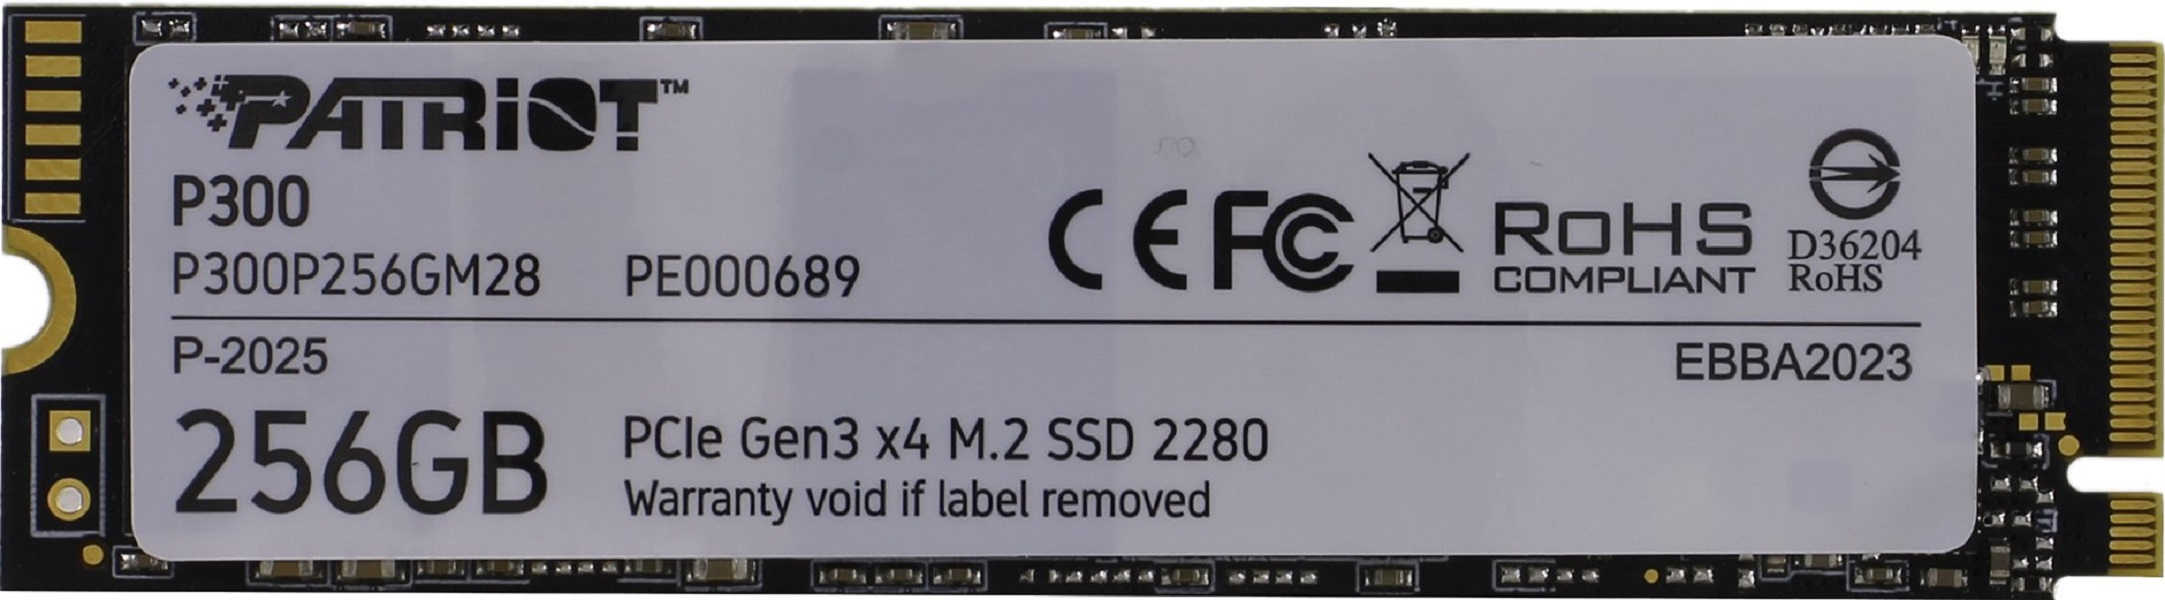 Обзор SSD накопителя Patriot P300 (NVMe)